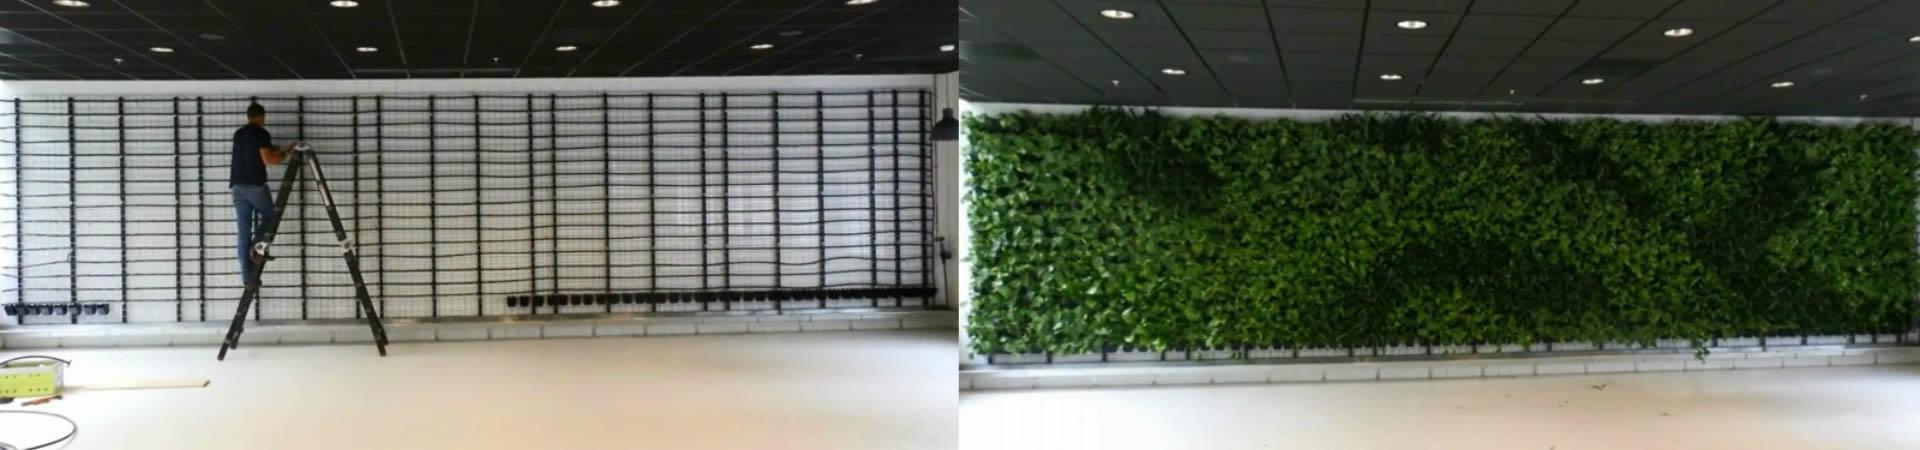 Green Wall - Bespoke